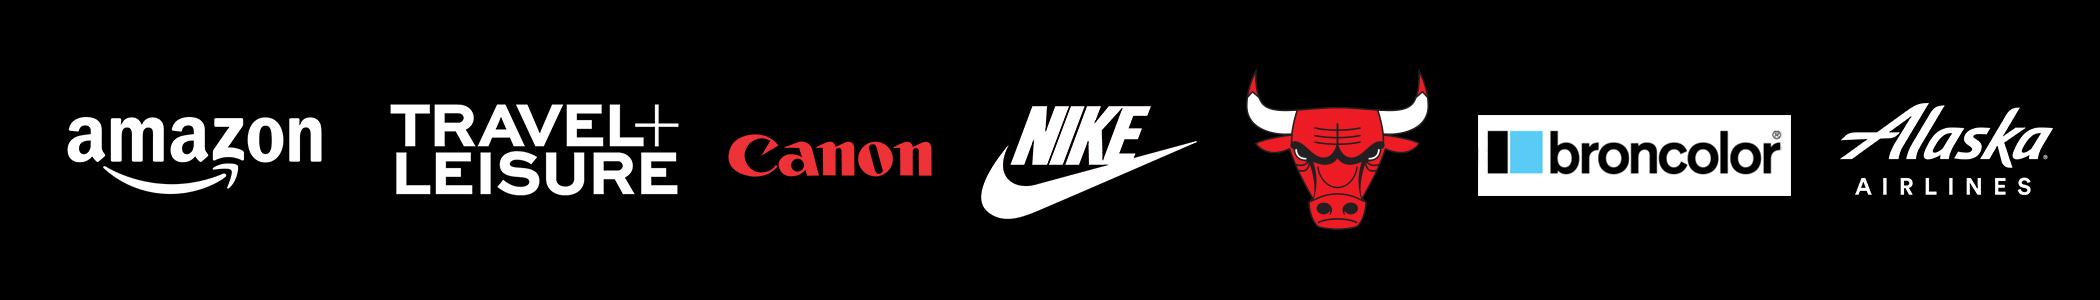 brands3.jpg